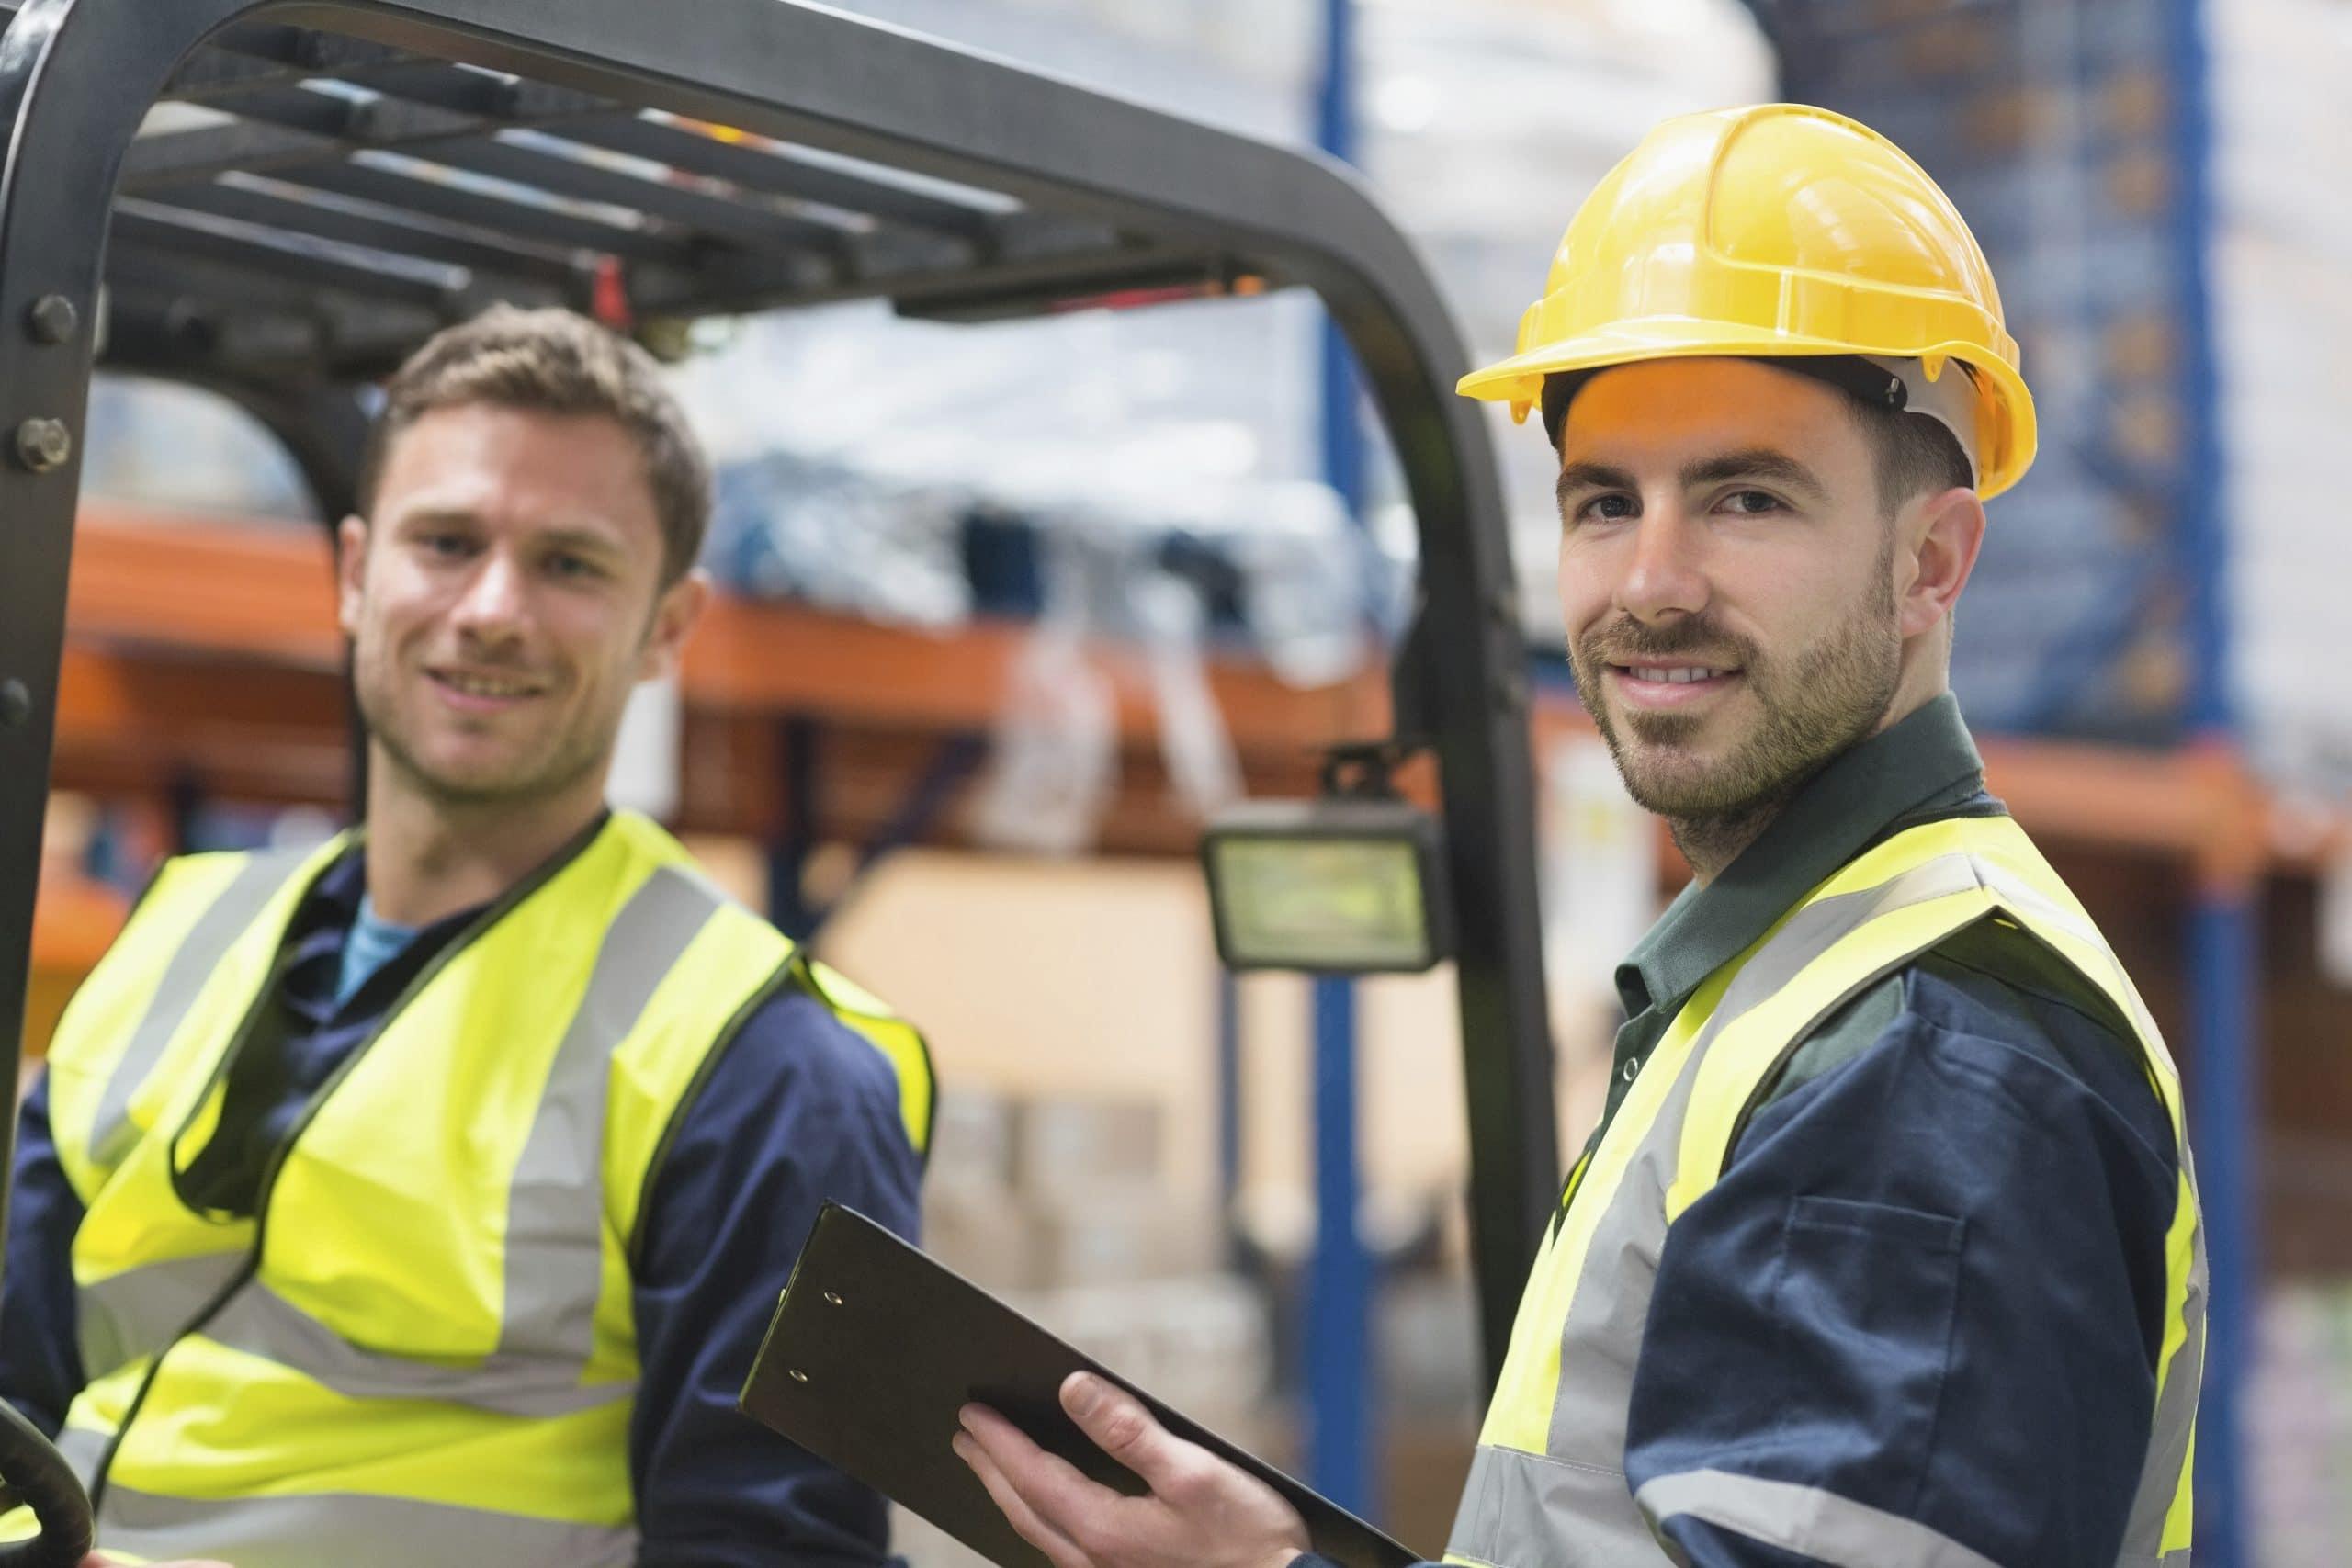 Forklift driver and supervisor